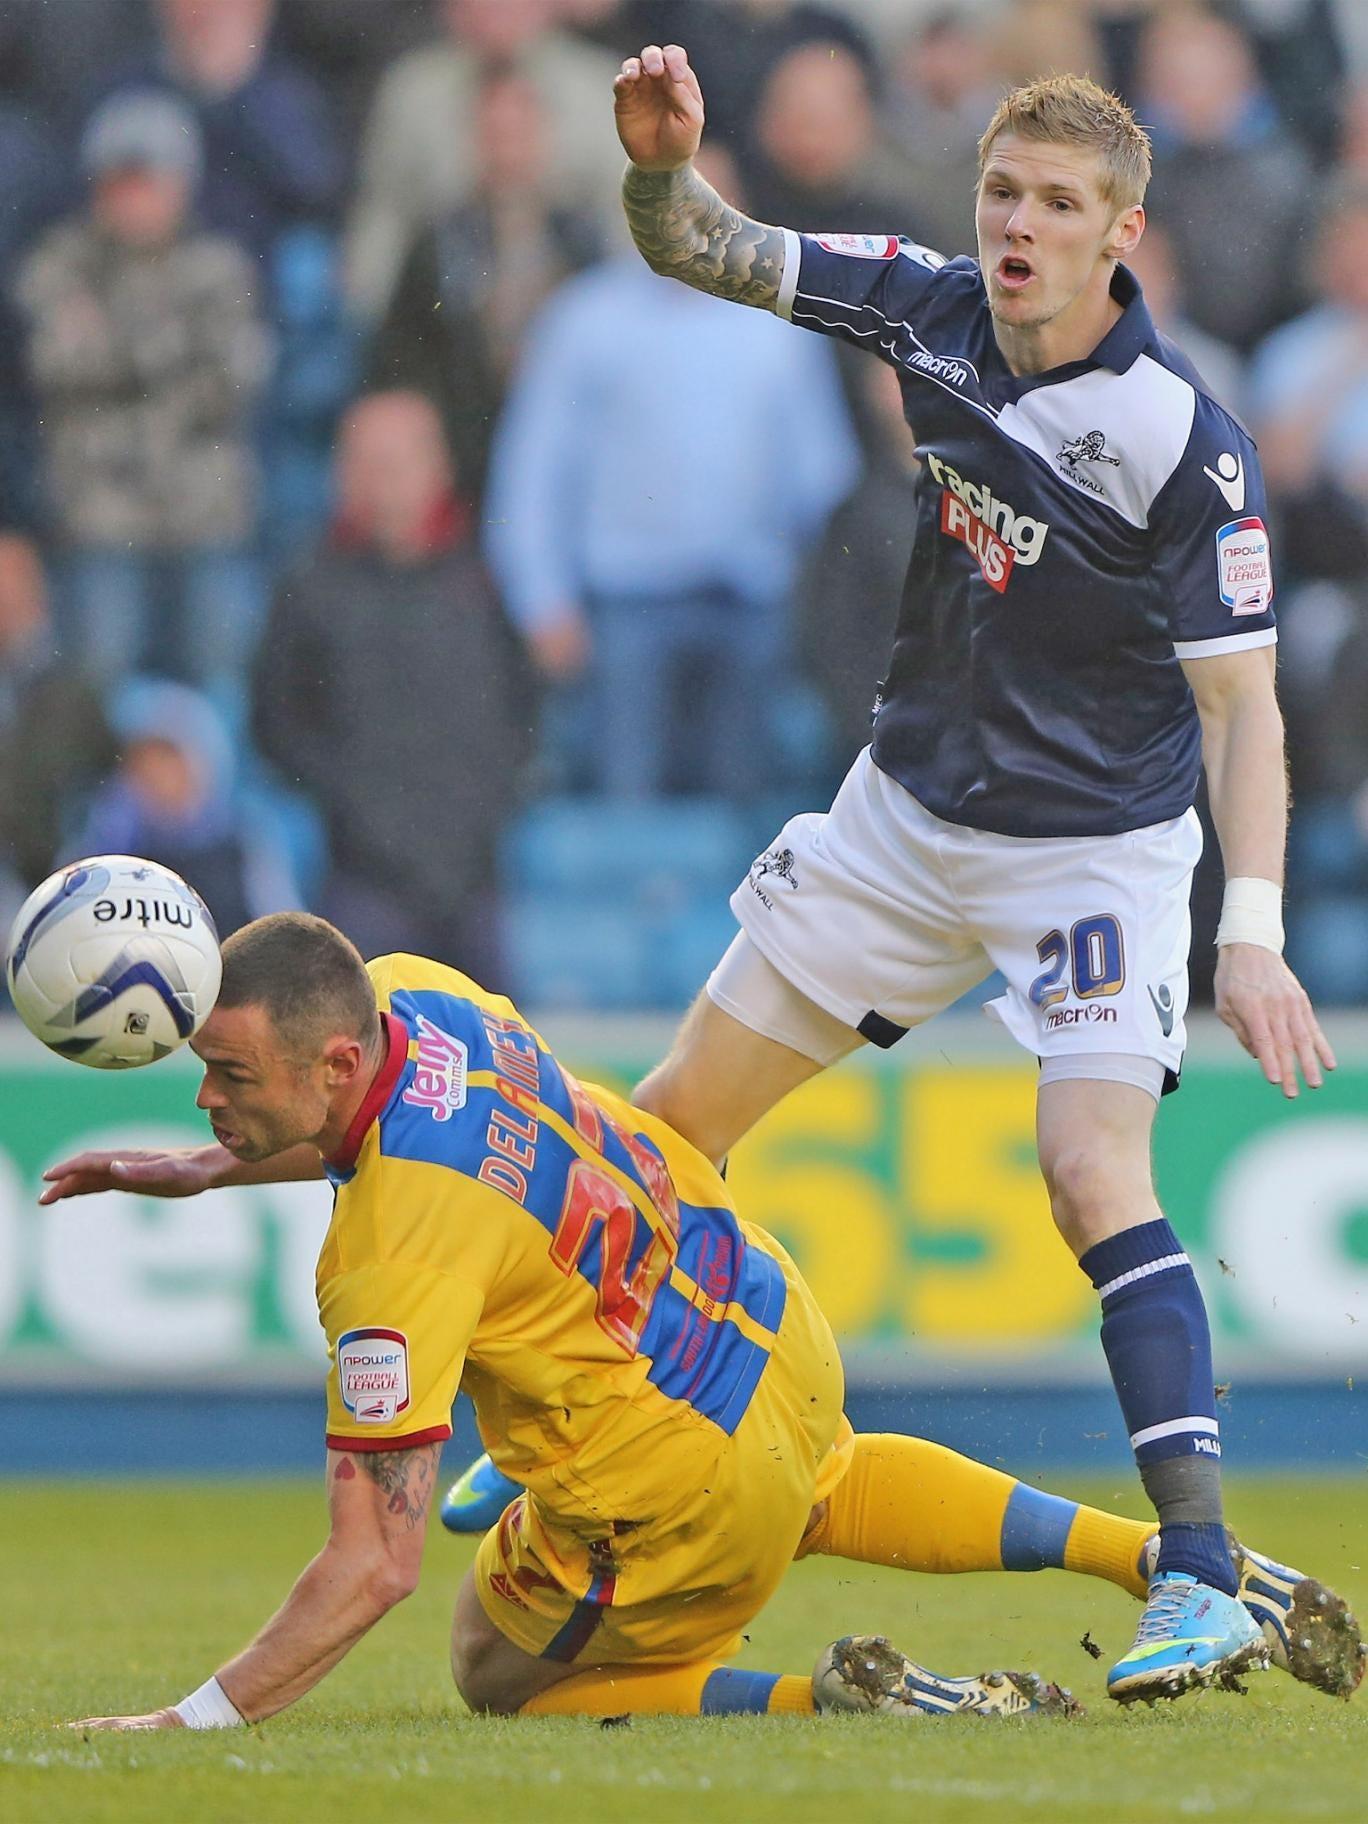 Millwall striker Andy Keogh has a shot blocked by Damien Delaney